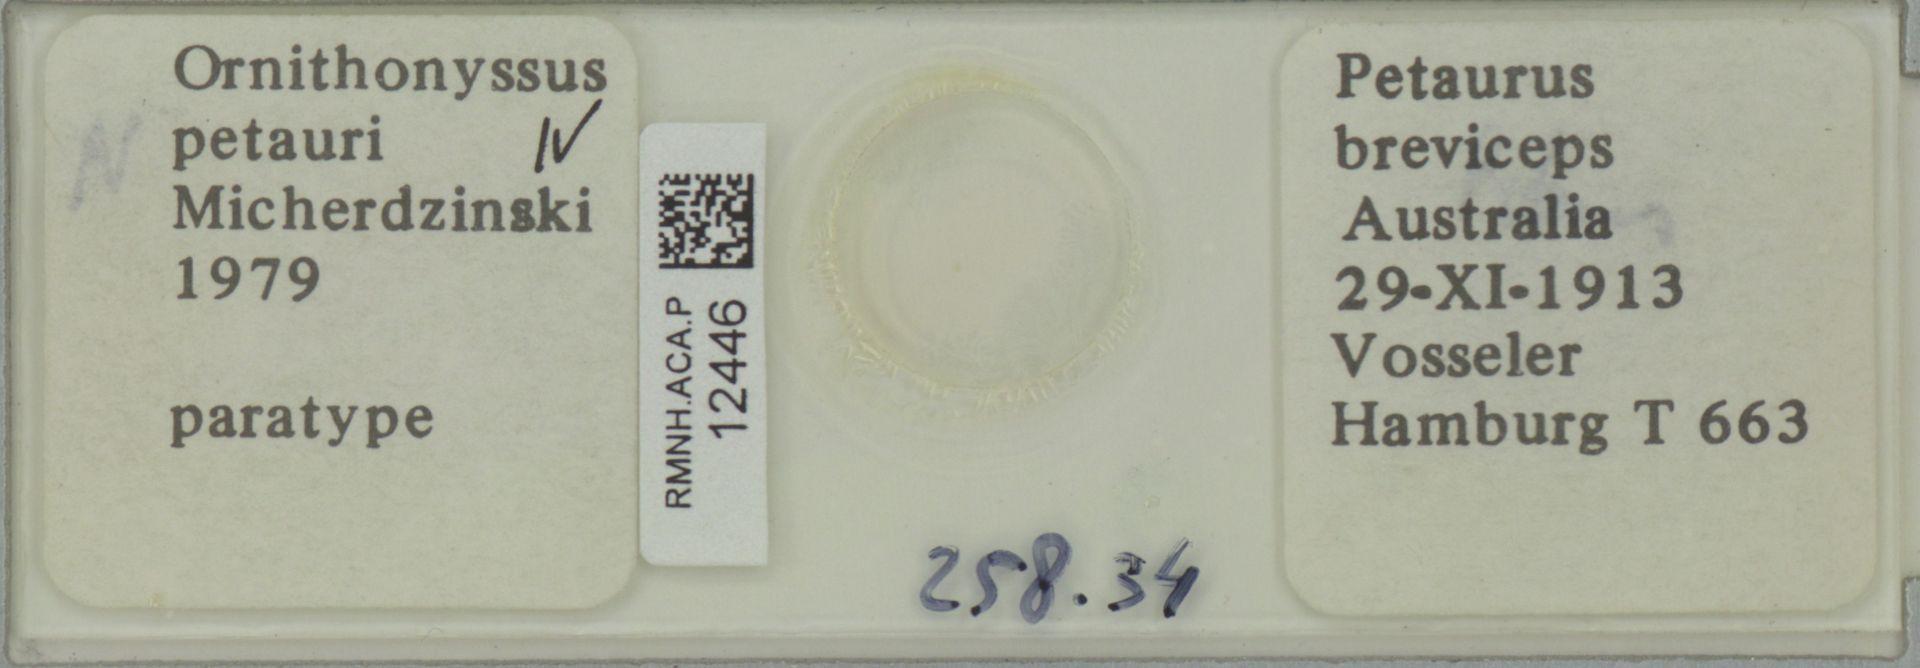 RMNH.ACA.P.12446 | Ornithonyssus petauri Micherdzinski 1979